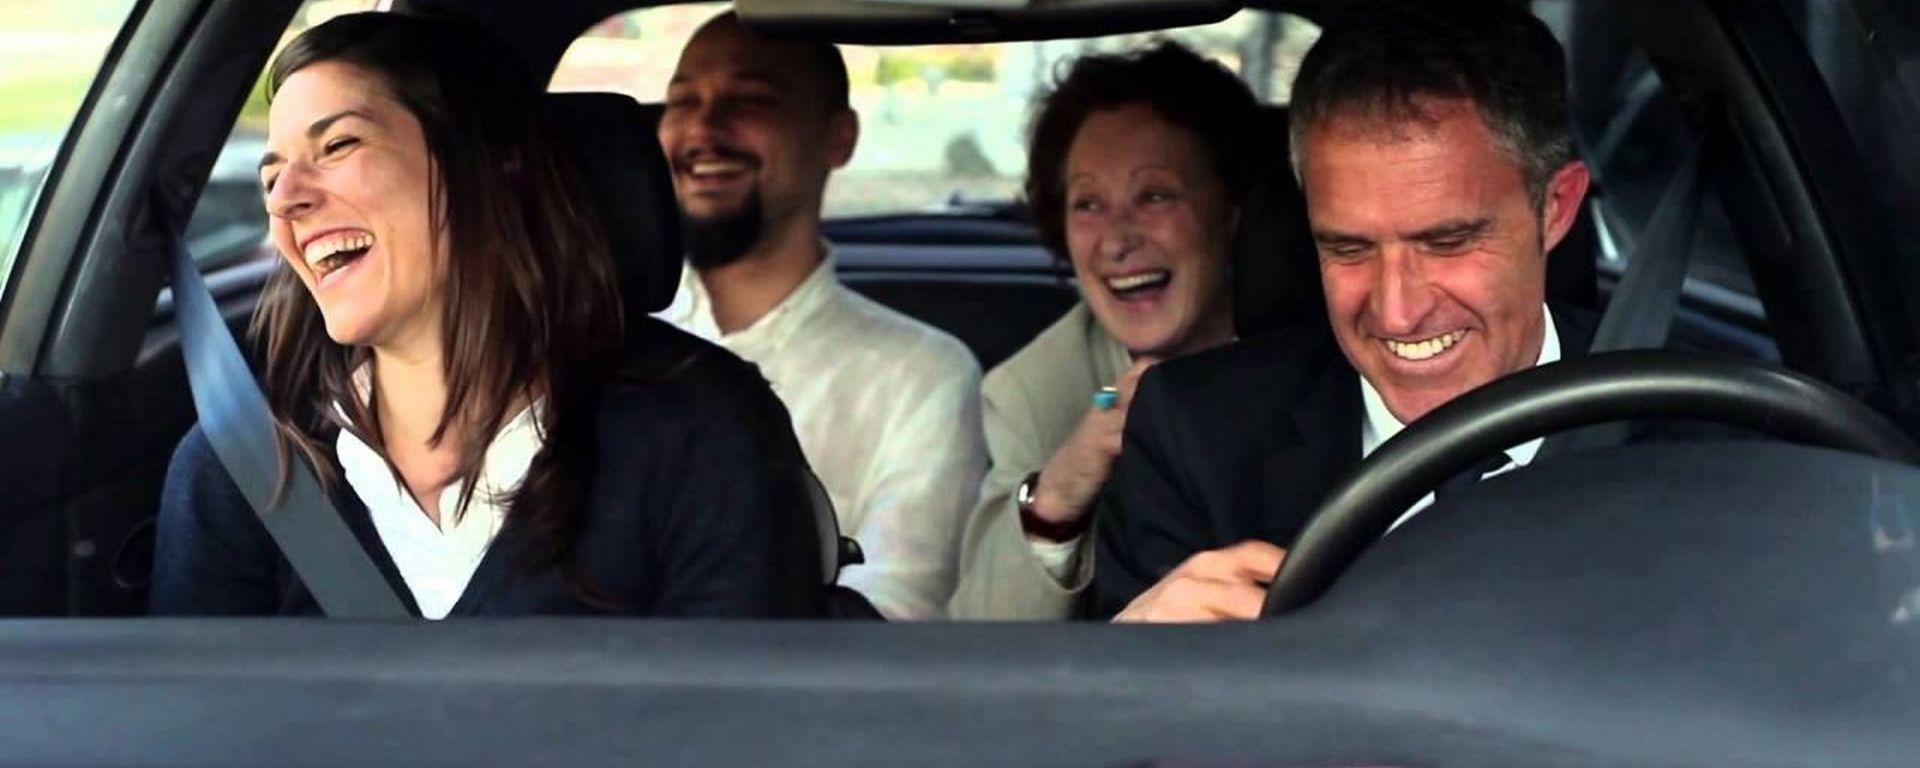 Carpooling, agli italiani piace sempre di più